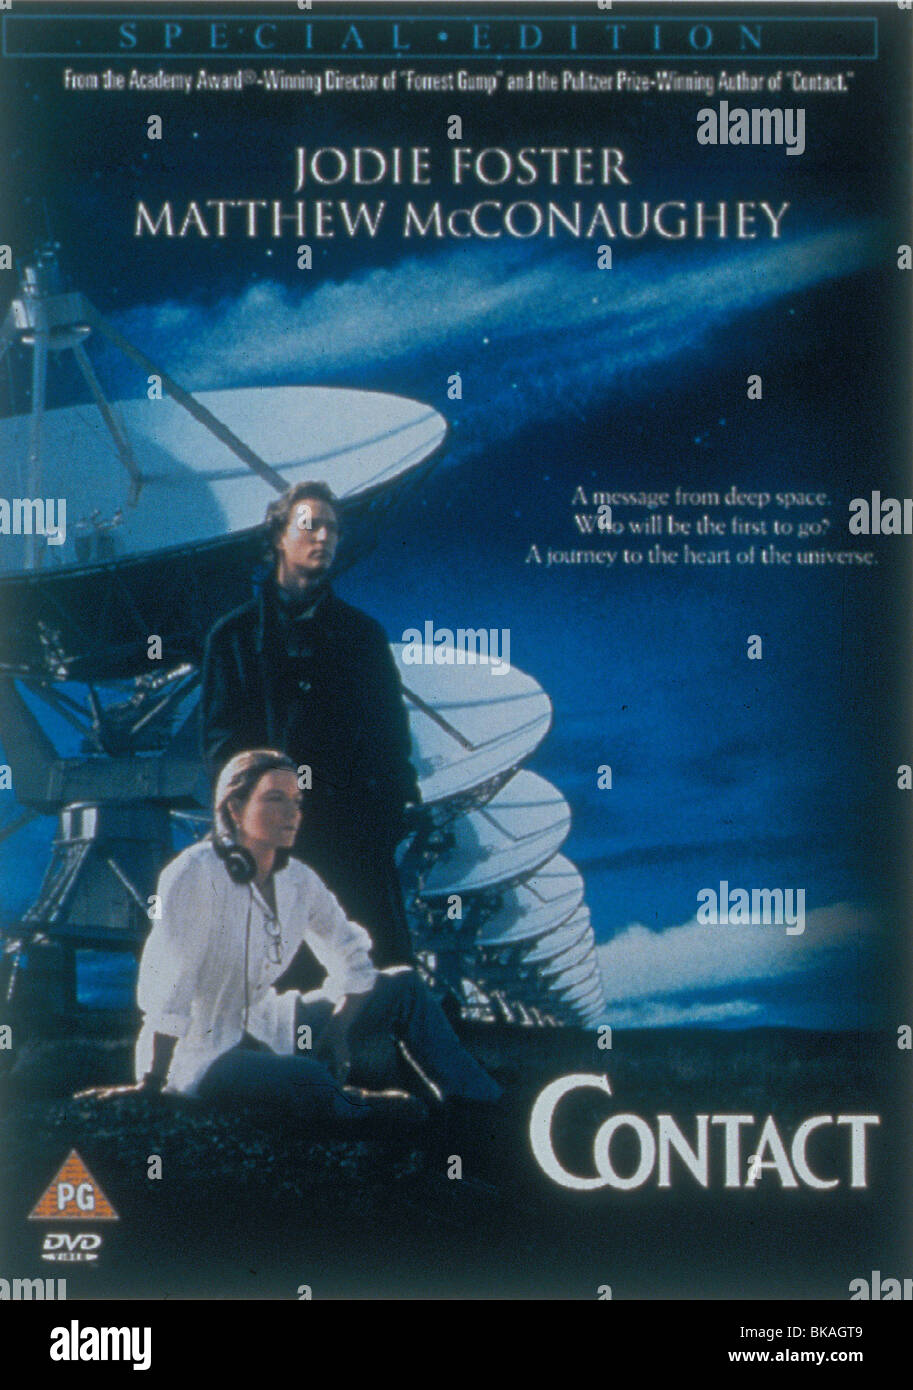 Contact 1997 Jodie Foster Matthew Mcconaughey Poster Cota 088 Stock Photo Alamy